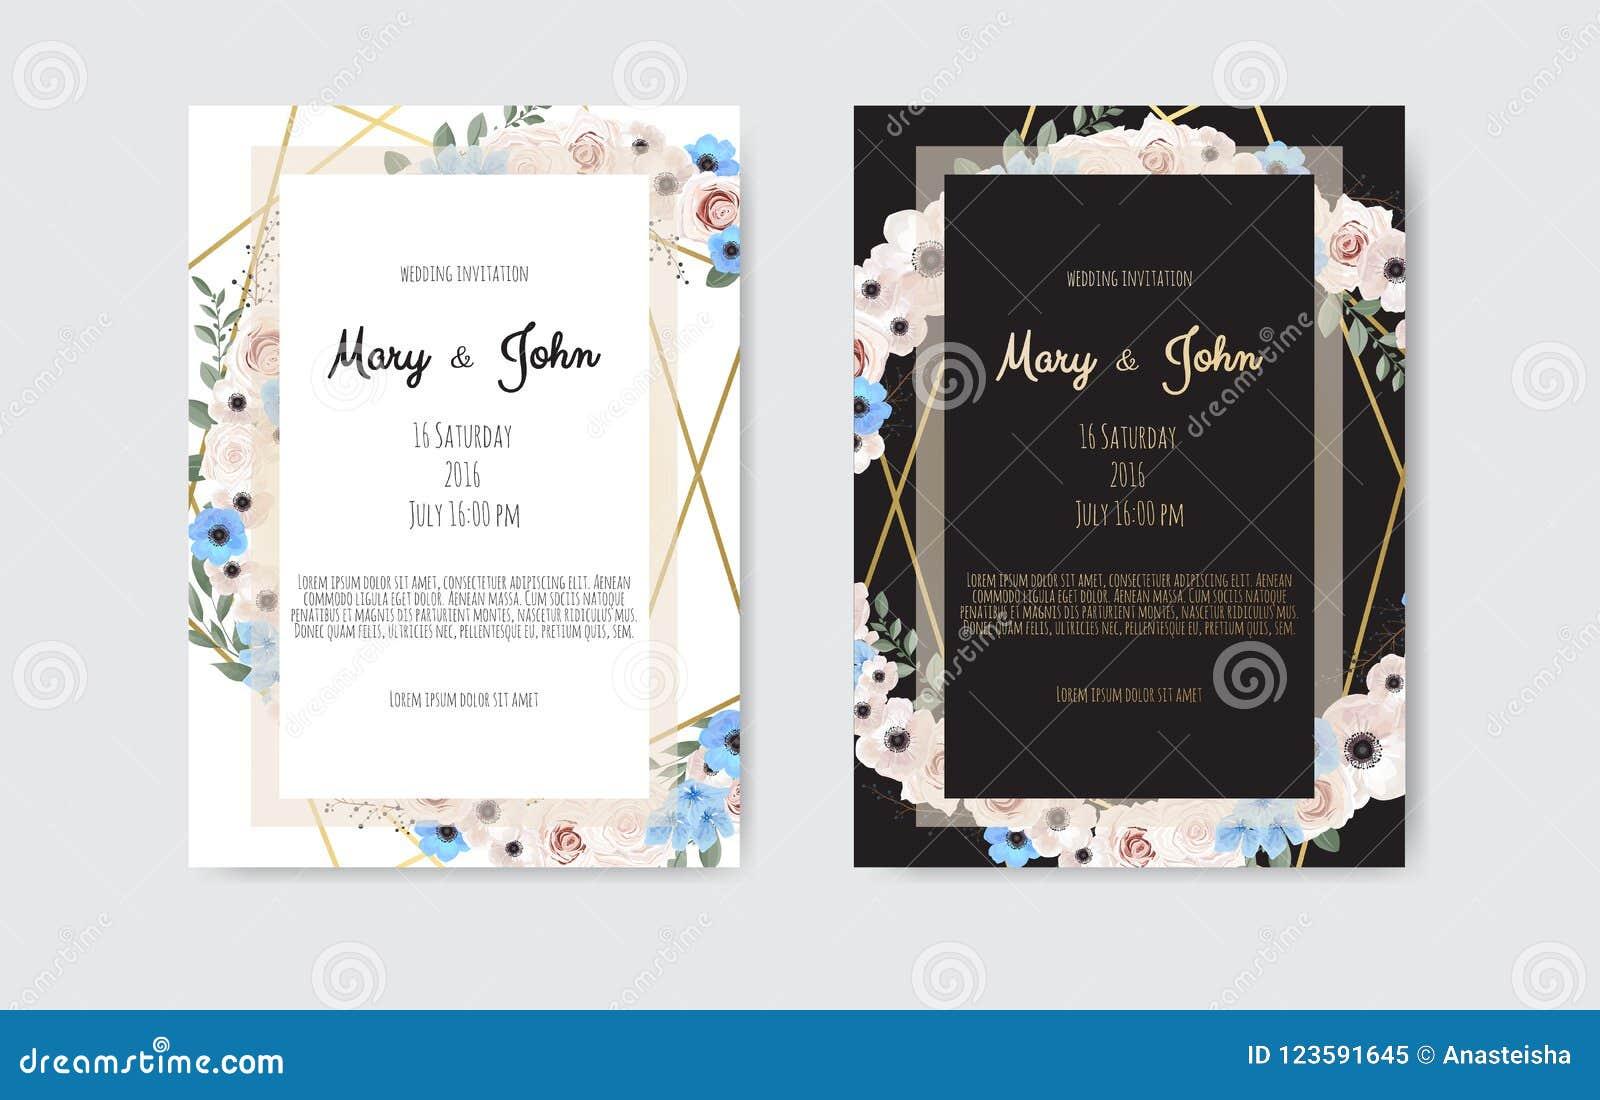 Fleurs De Conception De Calibre De Carte D Invitation De Mariage